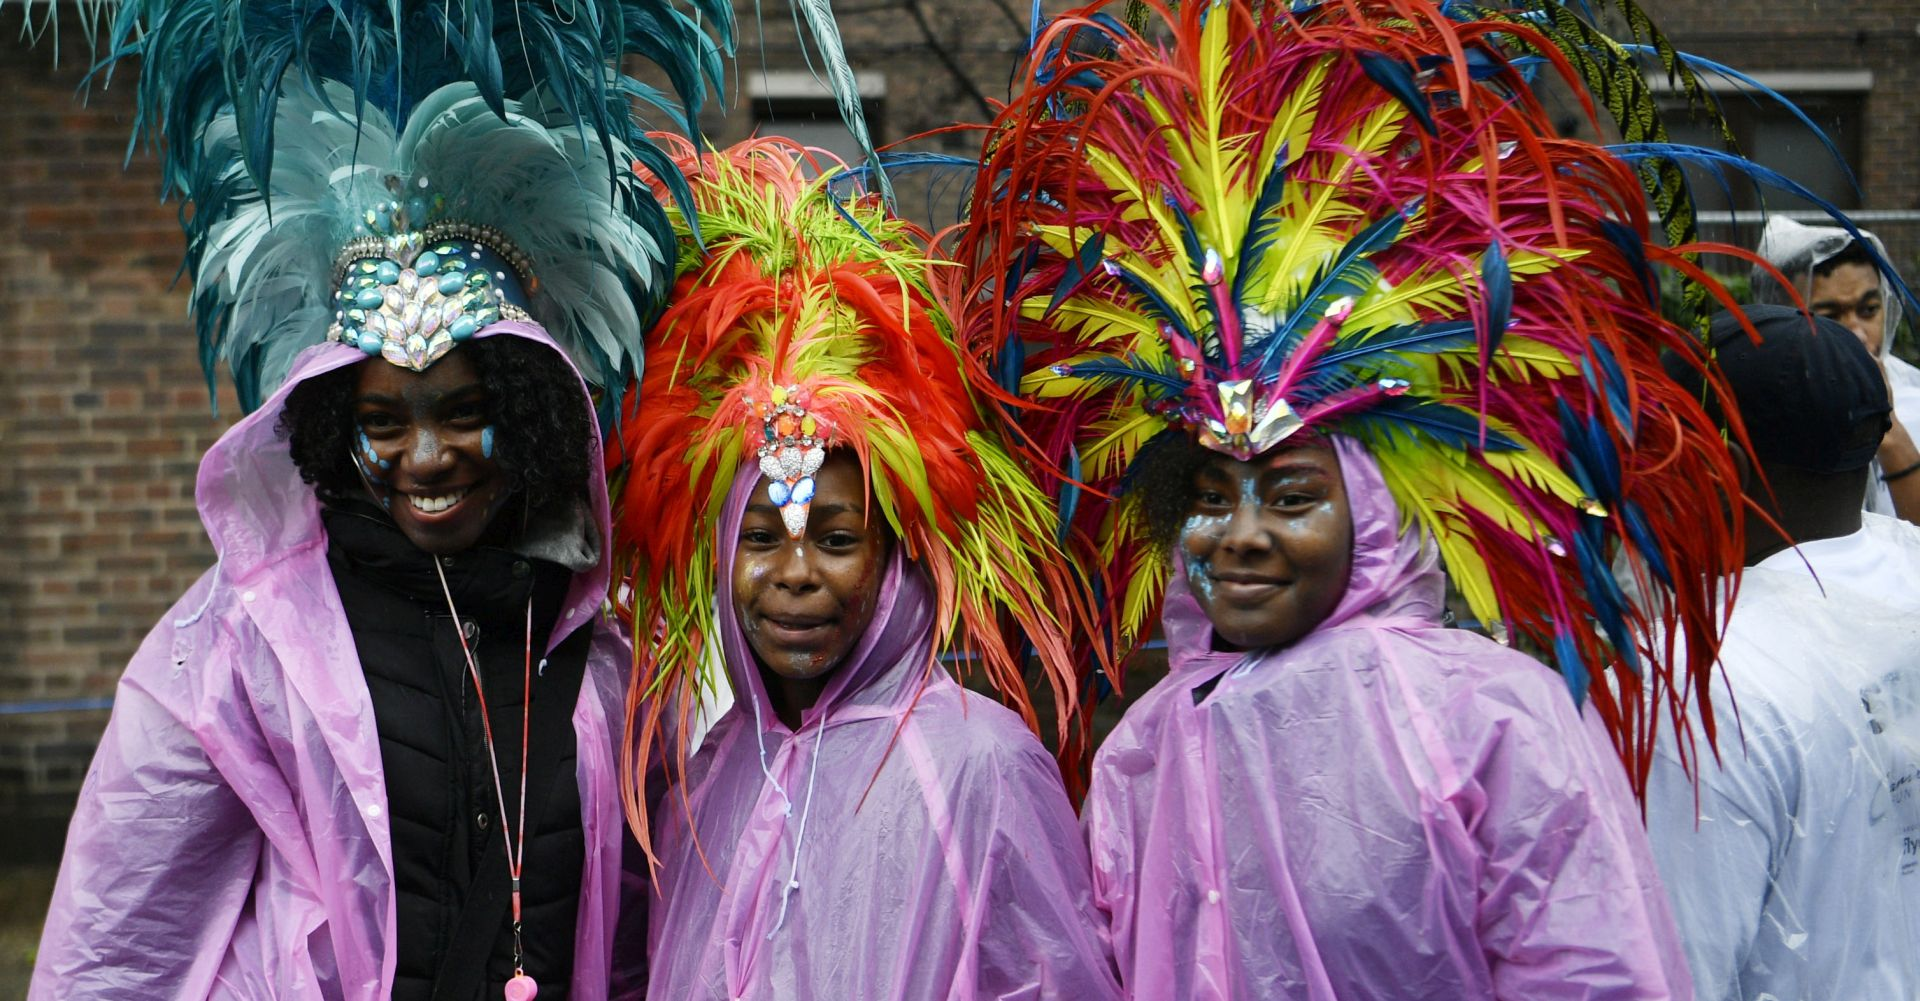 Mnoštvo na londonskom karnevalu na Notting Hillu prkosilo jakoj kiši